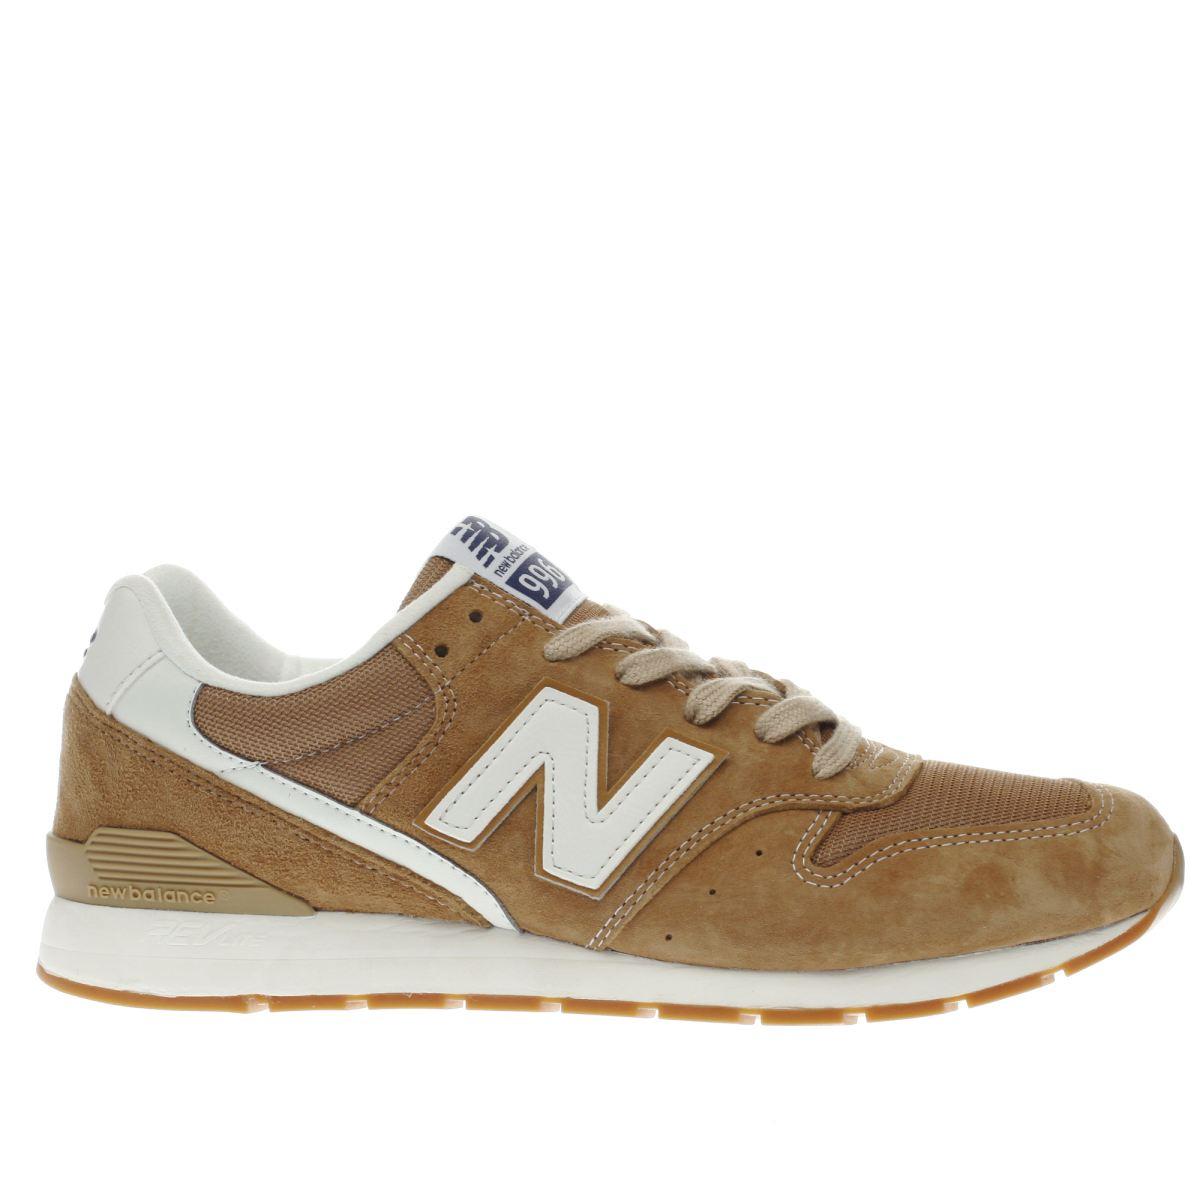 new balance tan 996 trainers